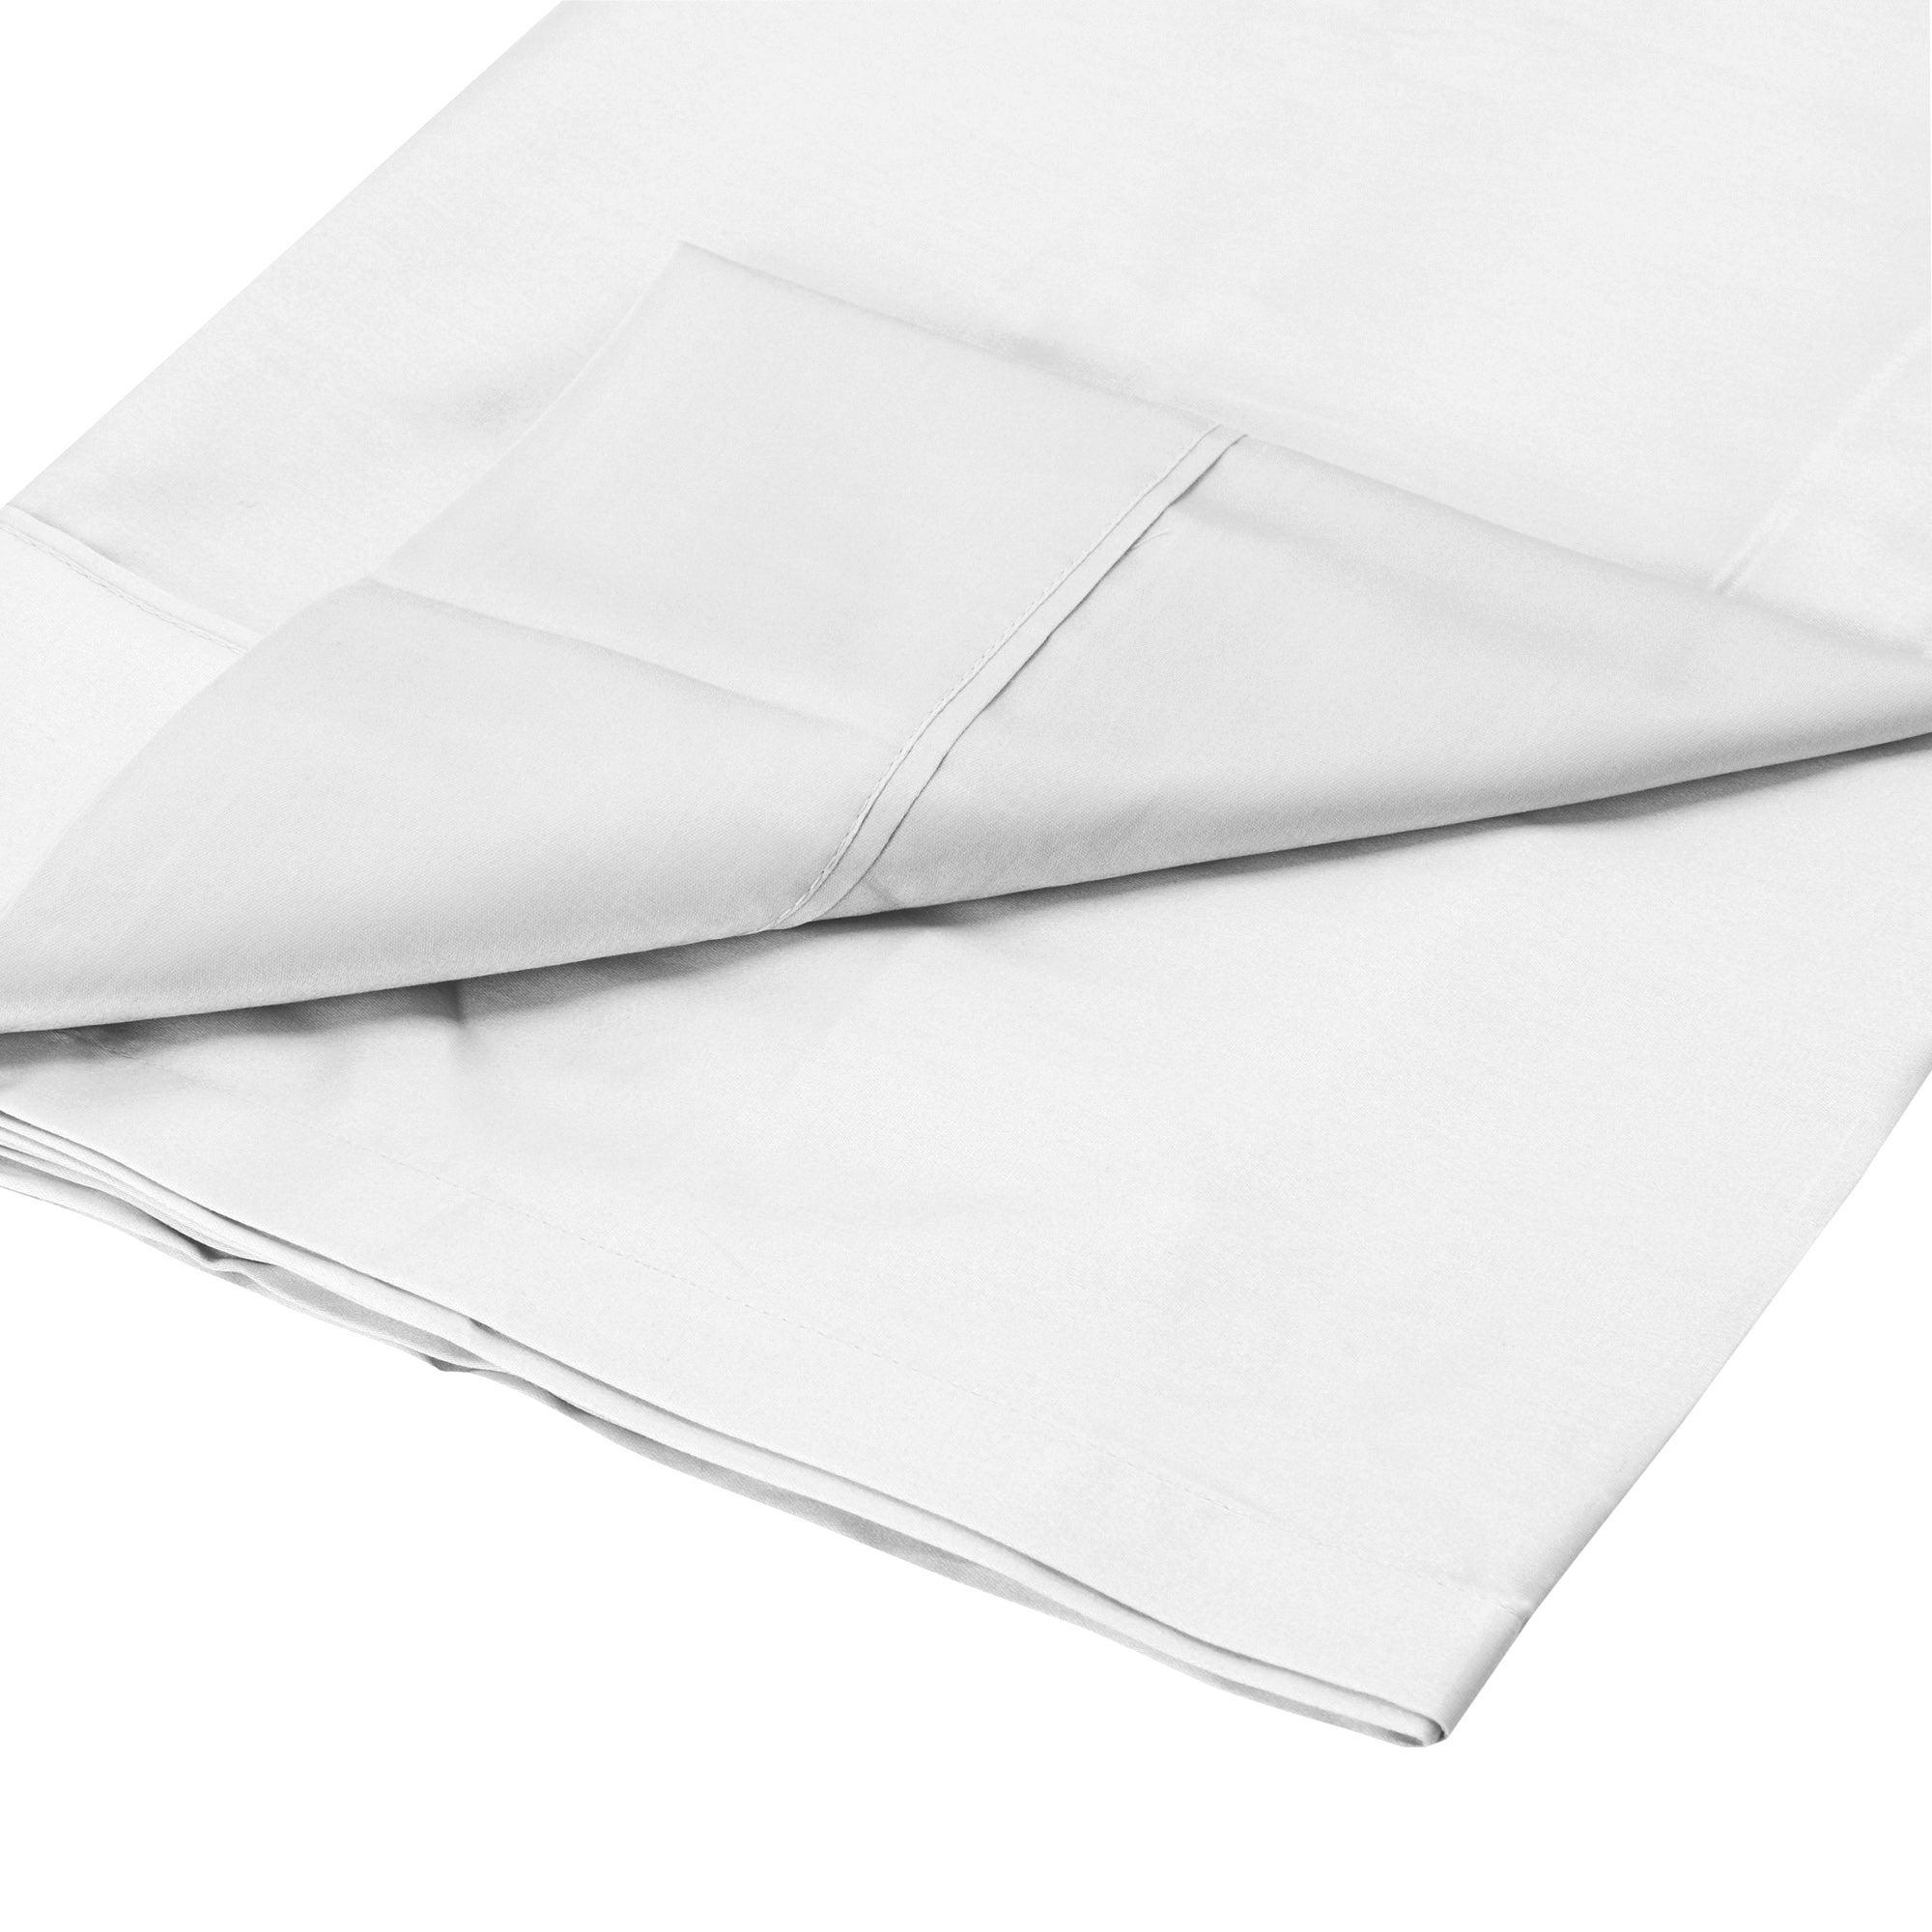 Photo of Dorma 300 thread count 100 cotton percale plain flat sheet white